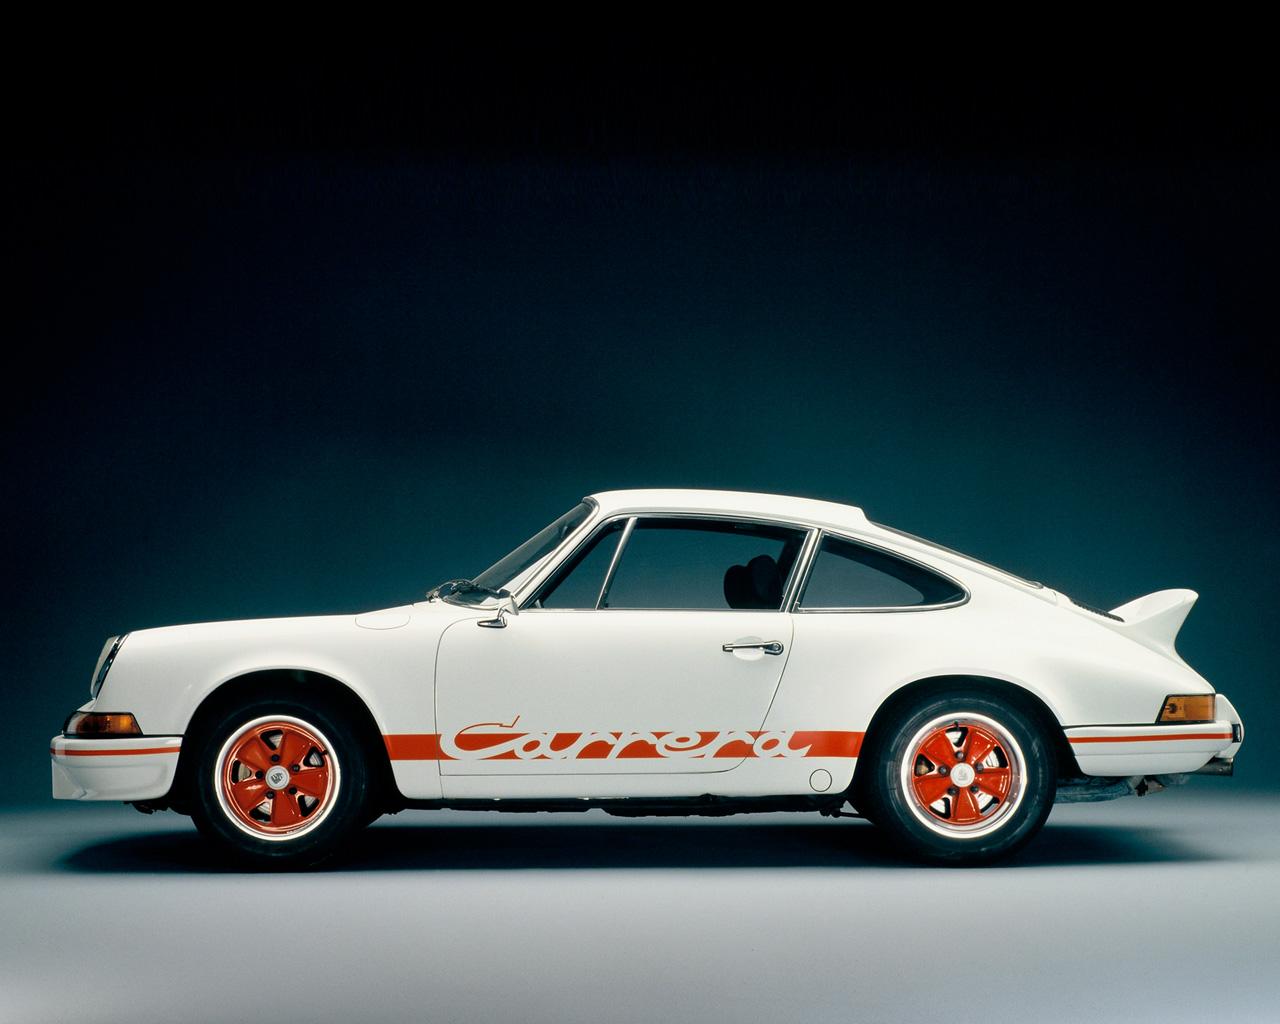 asaucerfulofwheels 1973 porsche 911 2 7 carrera rs 2004 porsche 911. Black Bedroom Furniture Sets. Home Design Ideas